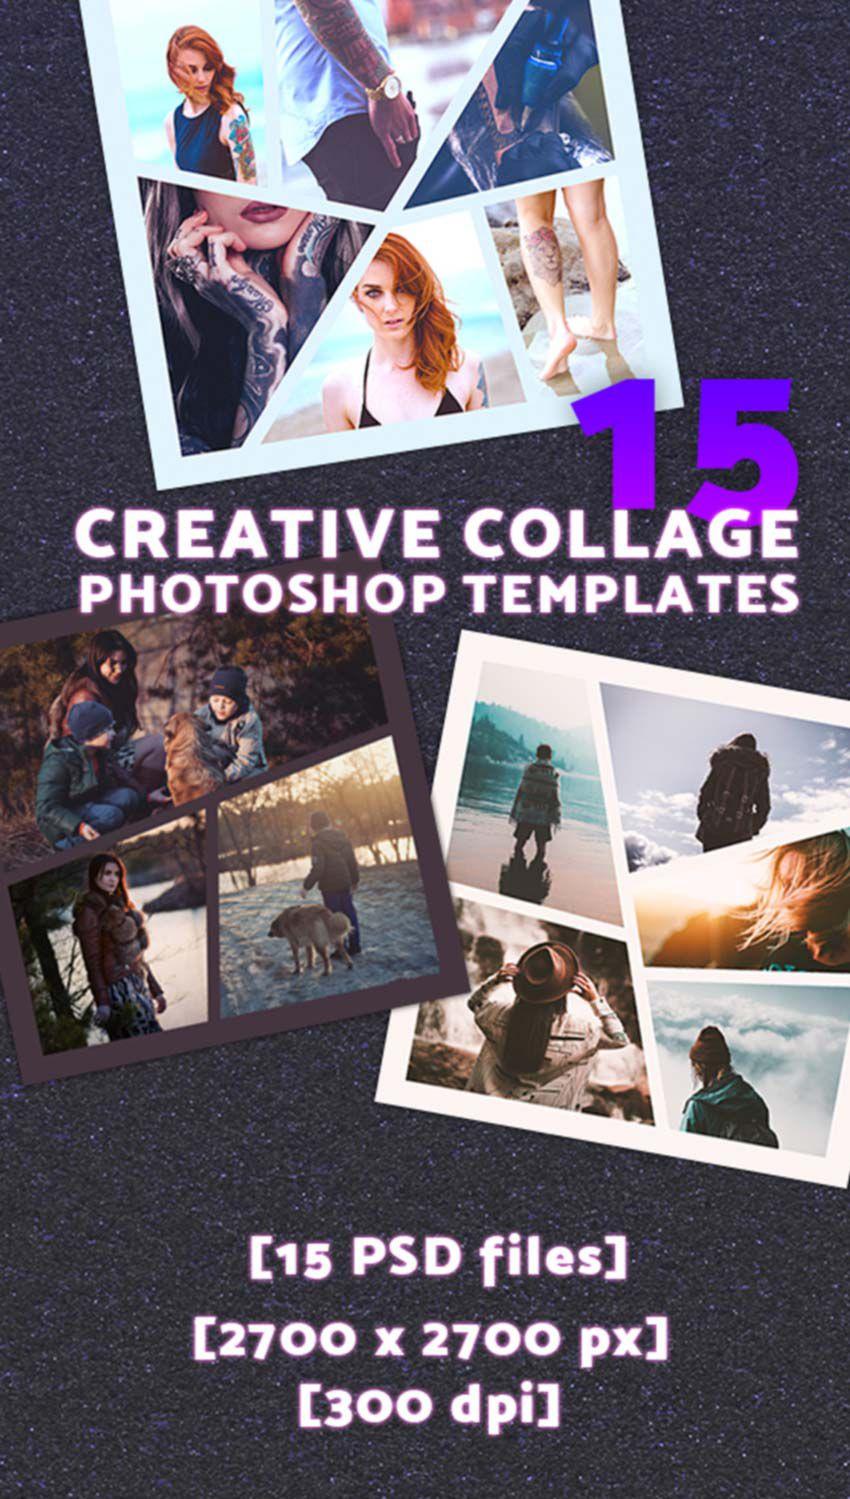 005 Impressive Free Download Template Picture Collage Maker Photo Full